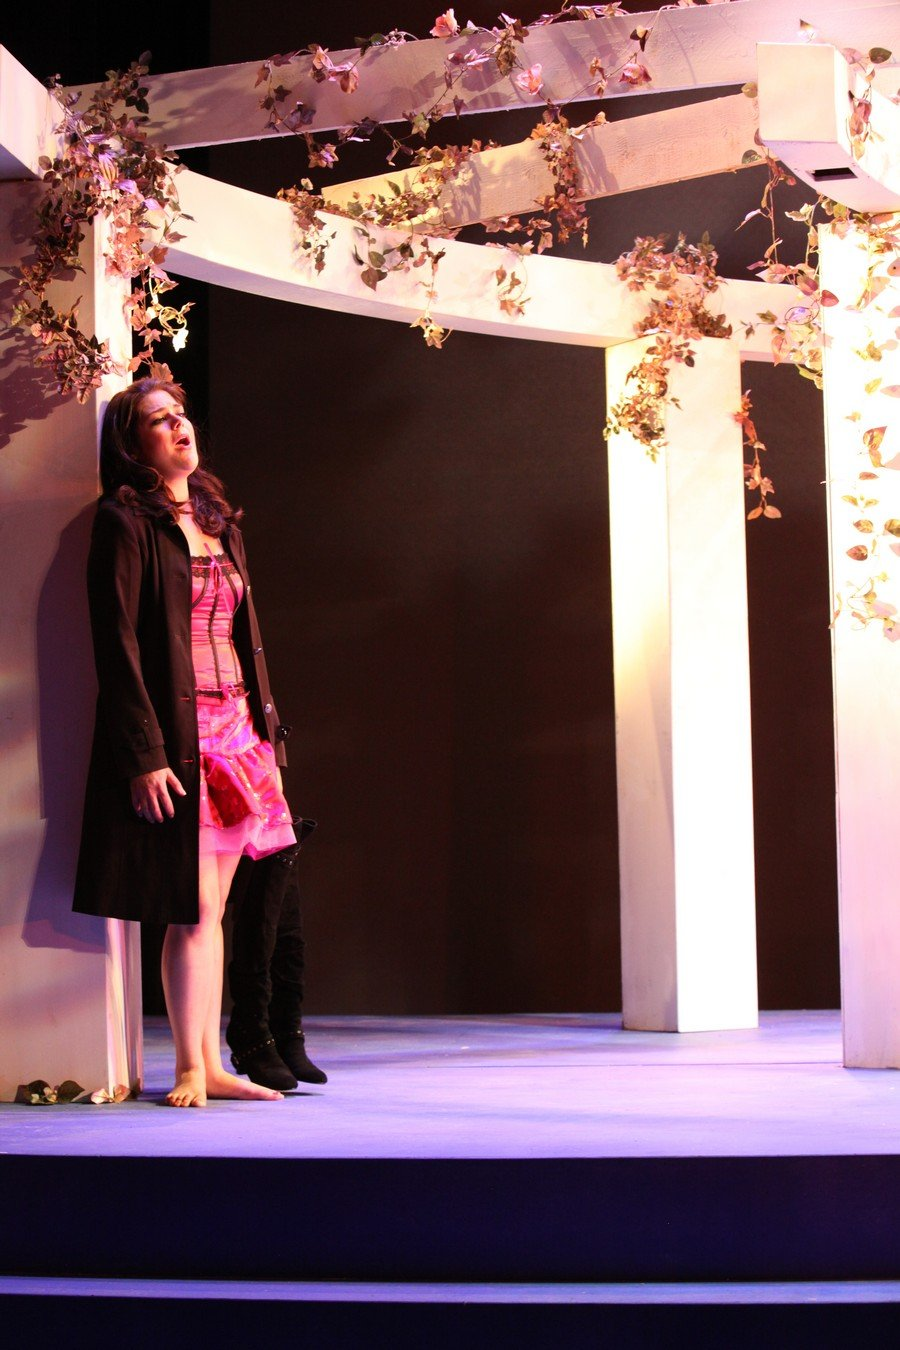 Connecticut Early Music Festival Stage Director: Eve Summer Conductor: Ian Watson Scenic Design: Julia Noulin-Merat Costume Design: Kathleen Doyle Lighting Design: Michael Clark Wonson